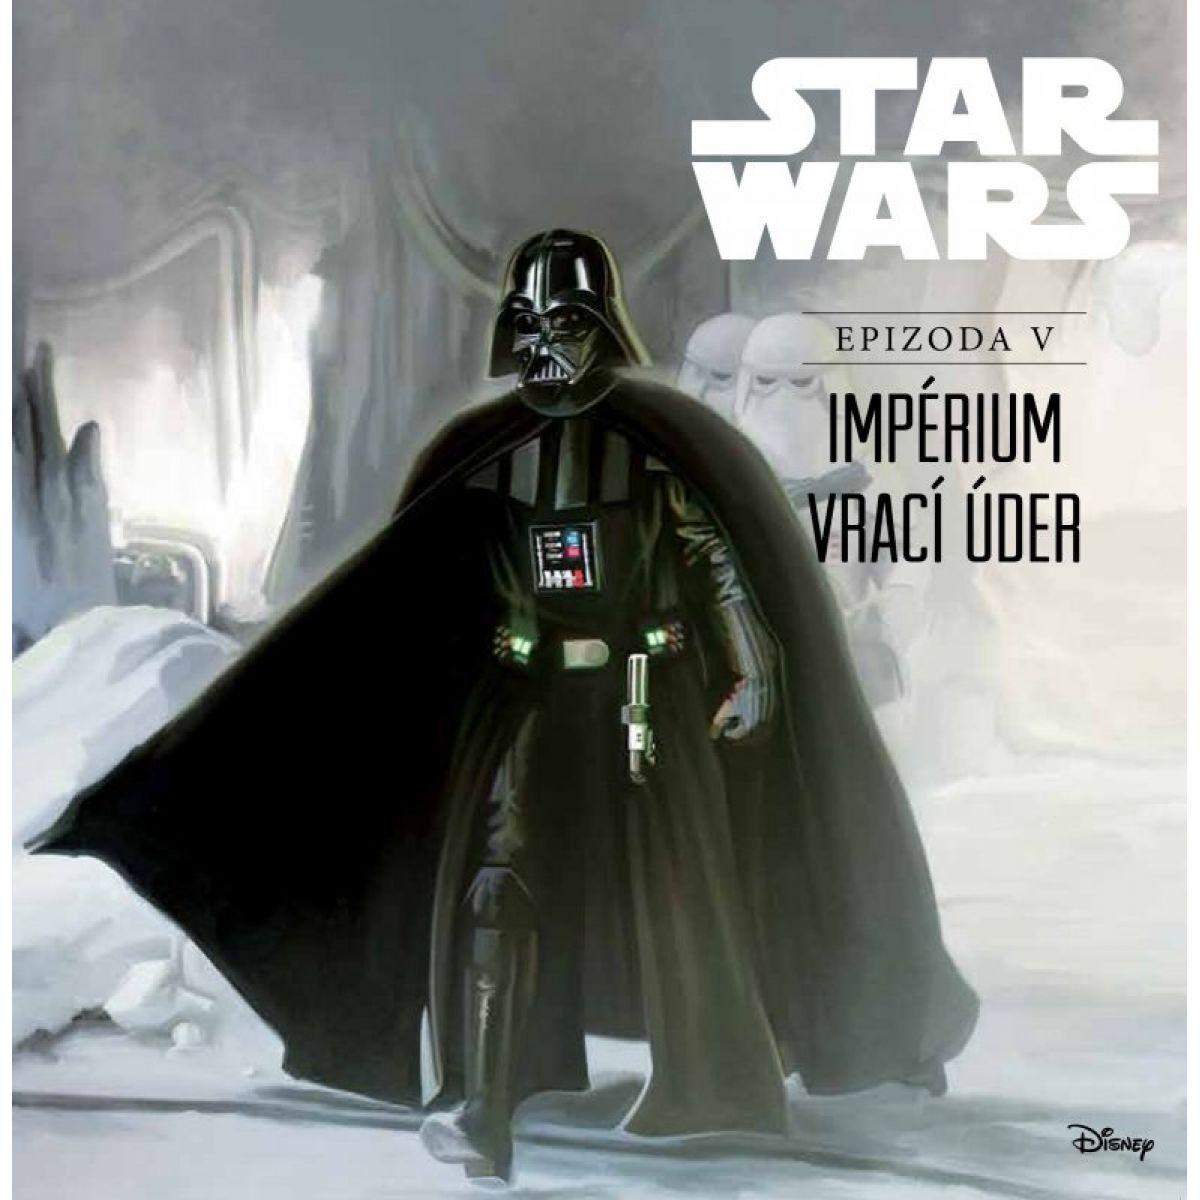 Star Wars Impérium vrací úder